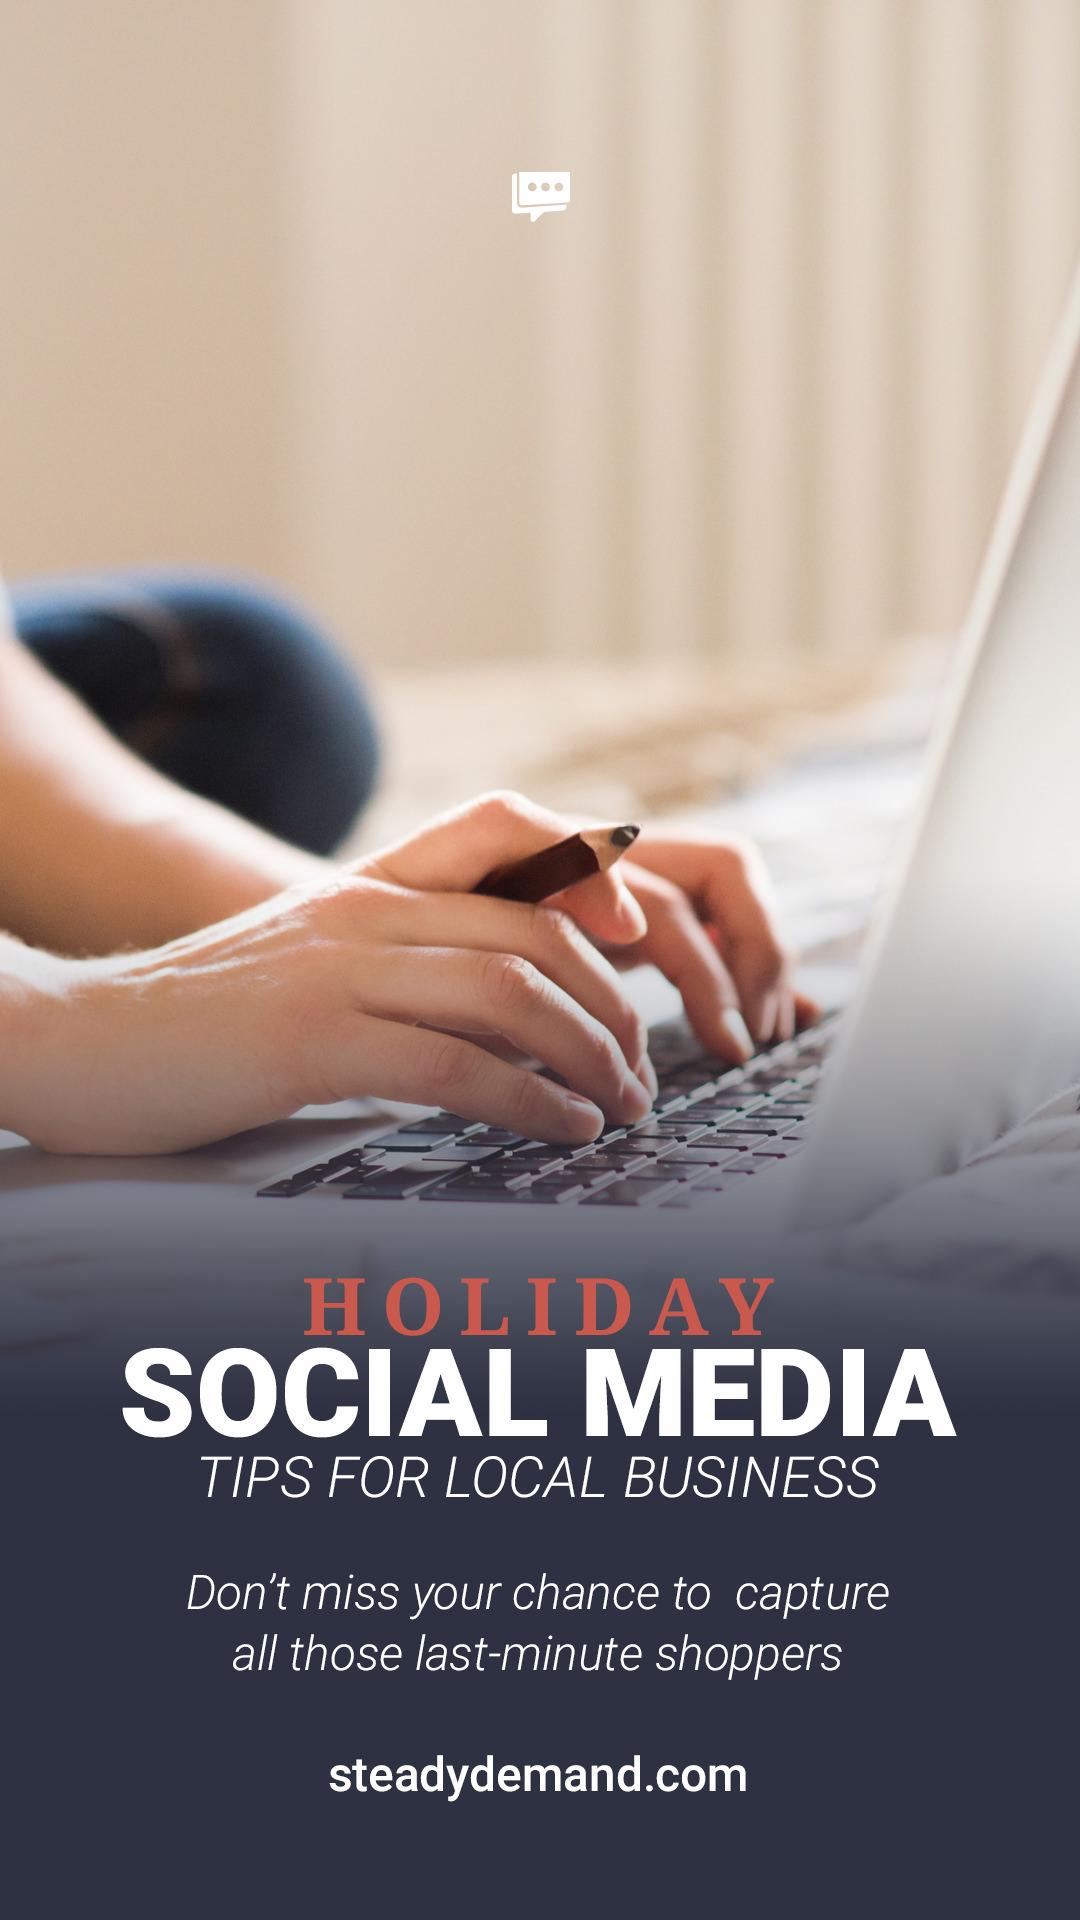 Helpful list of last-minute business social media tips for the holidays. #socialmediamarketing #contentmarketing #localbusiness